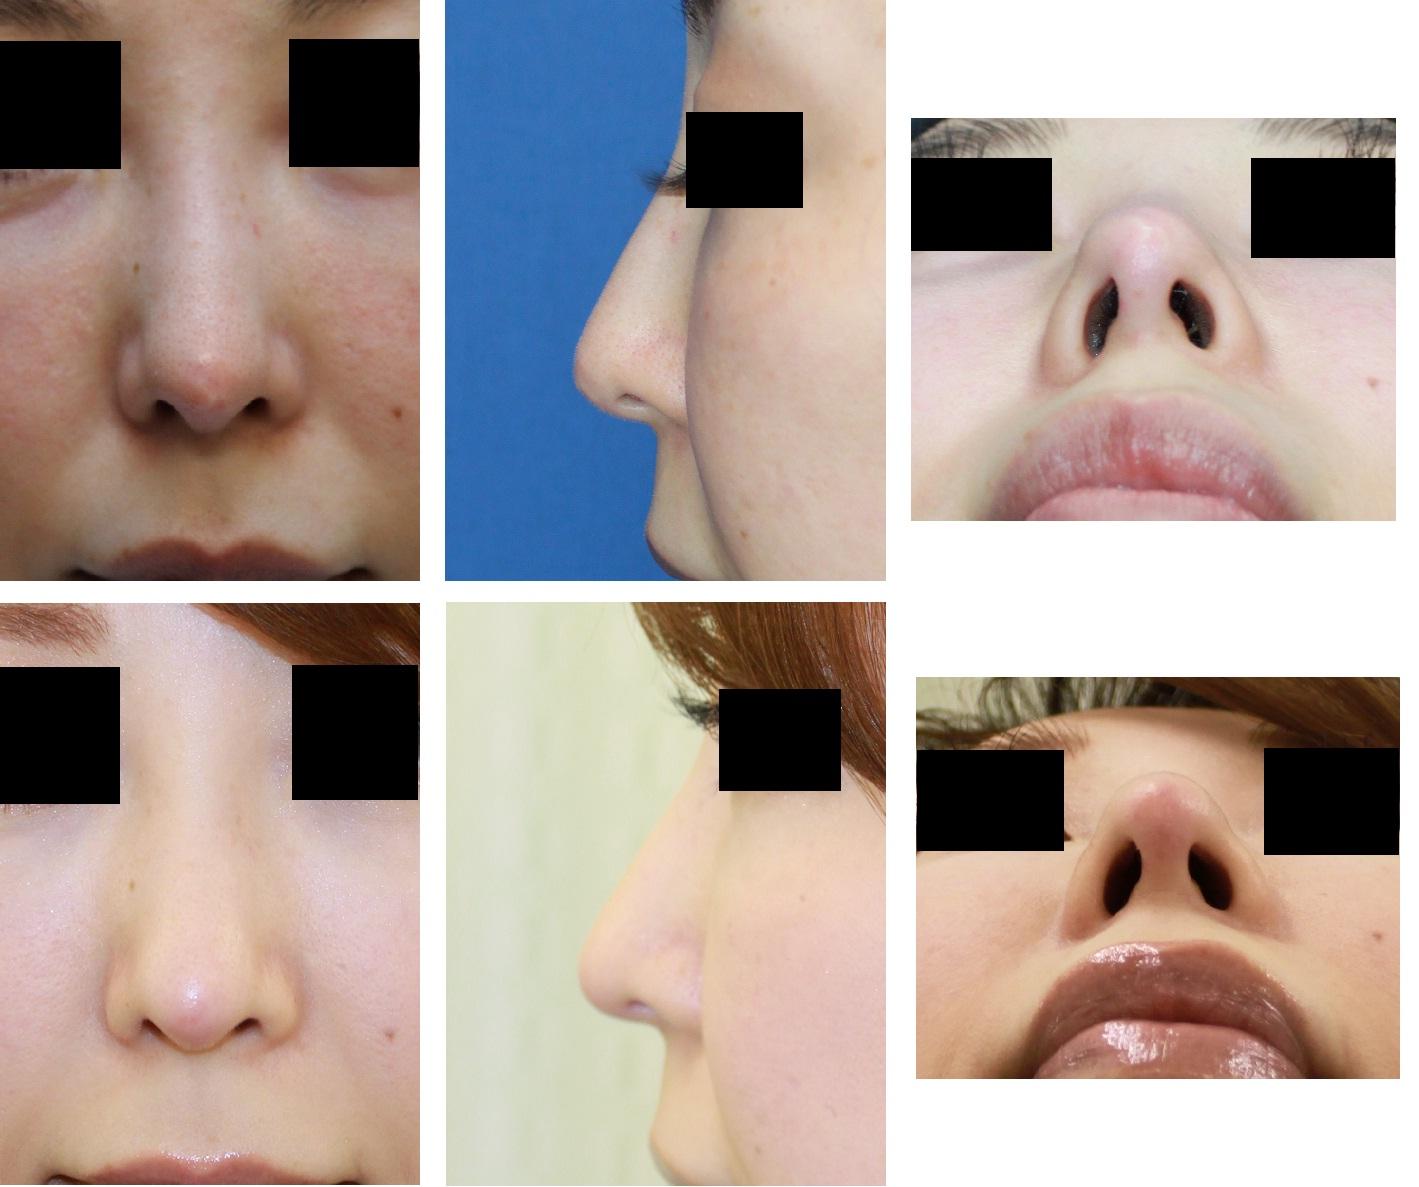 他院鼻先軟骨移植後修正術:  鼻先軟骨トリミング(部分切除) および鼻先婦人科軟部組織移植_d0092965_23525371.jpg